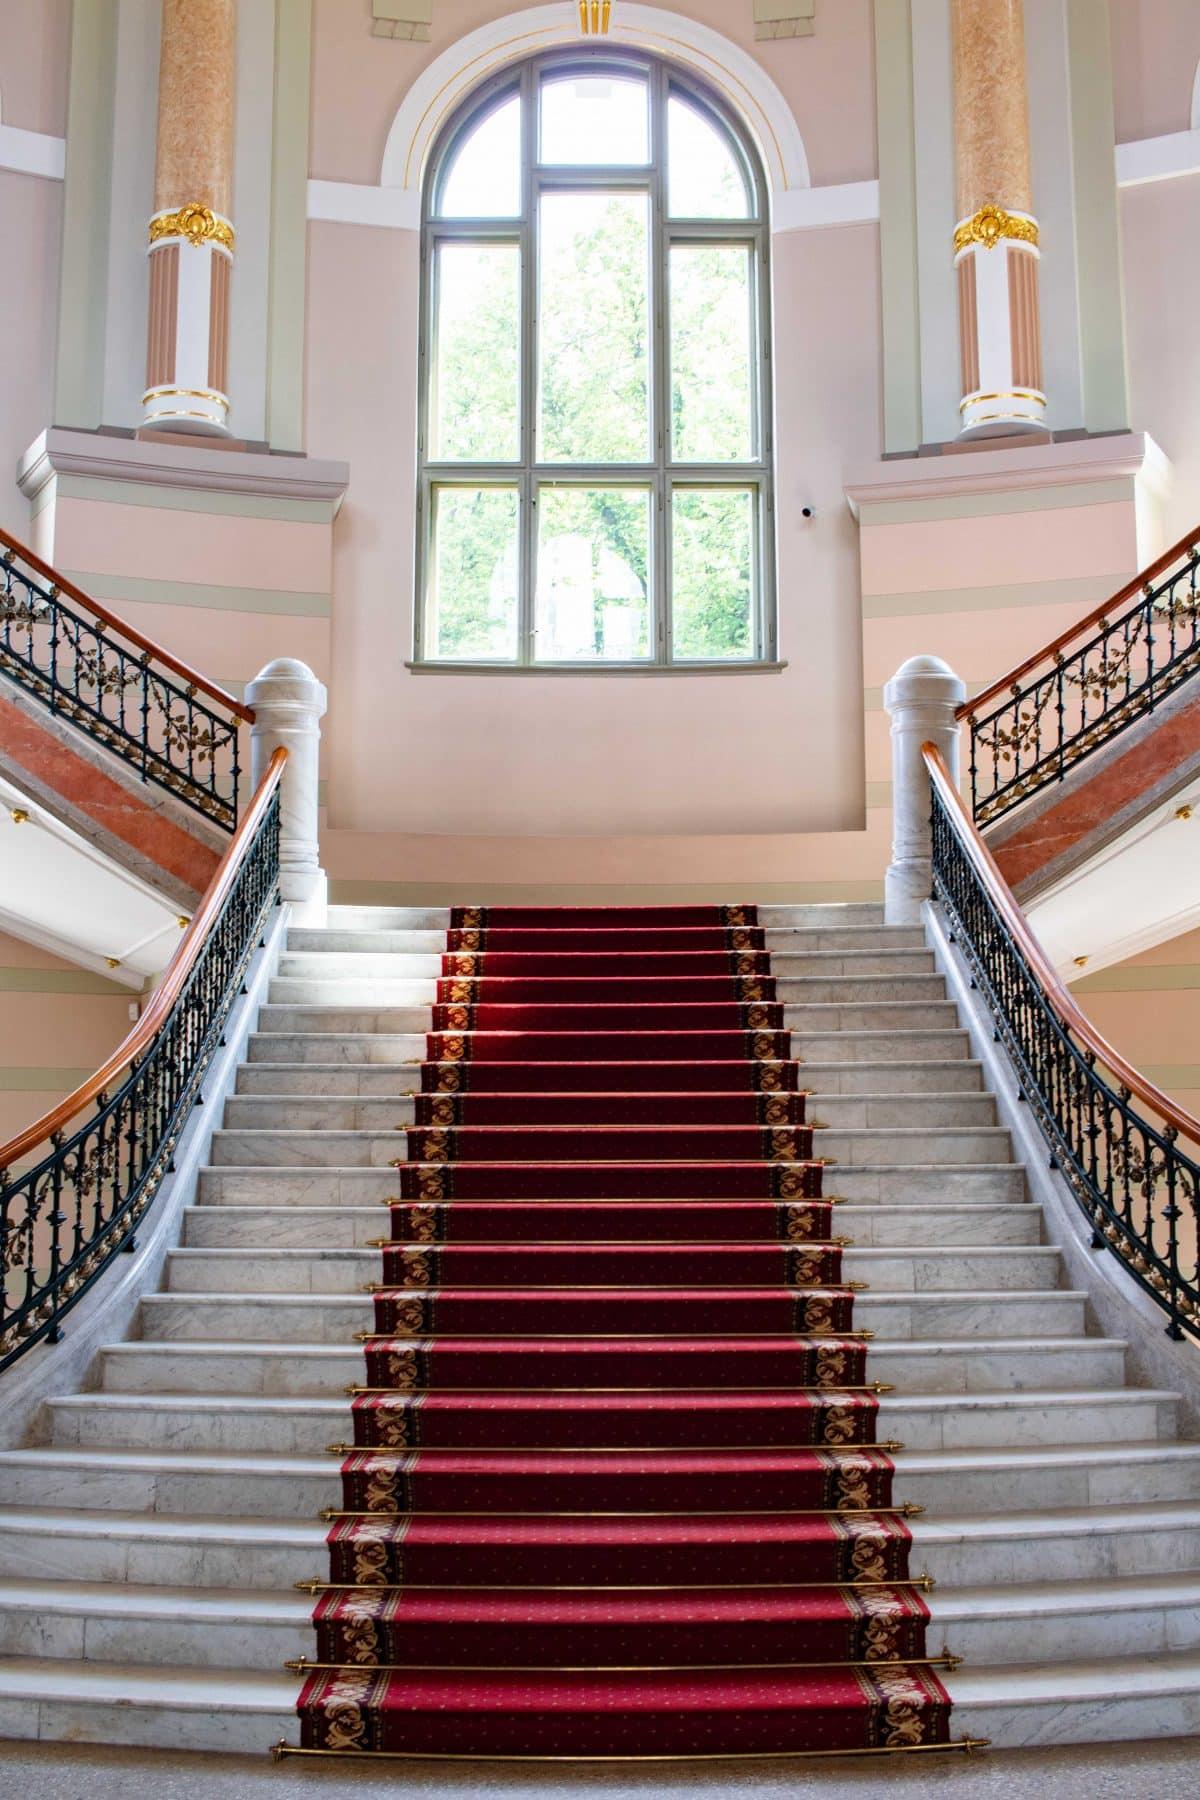 Riga Sehenswürdigkeiten Nationales Kunstmuseum - PASSENGER X